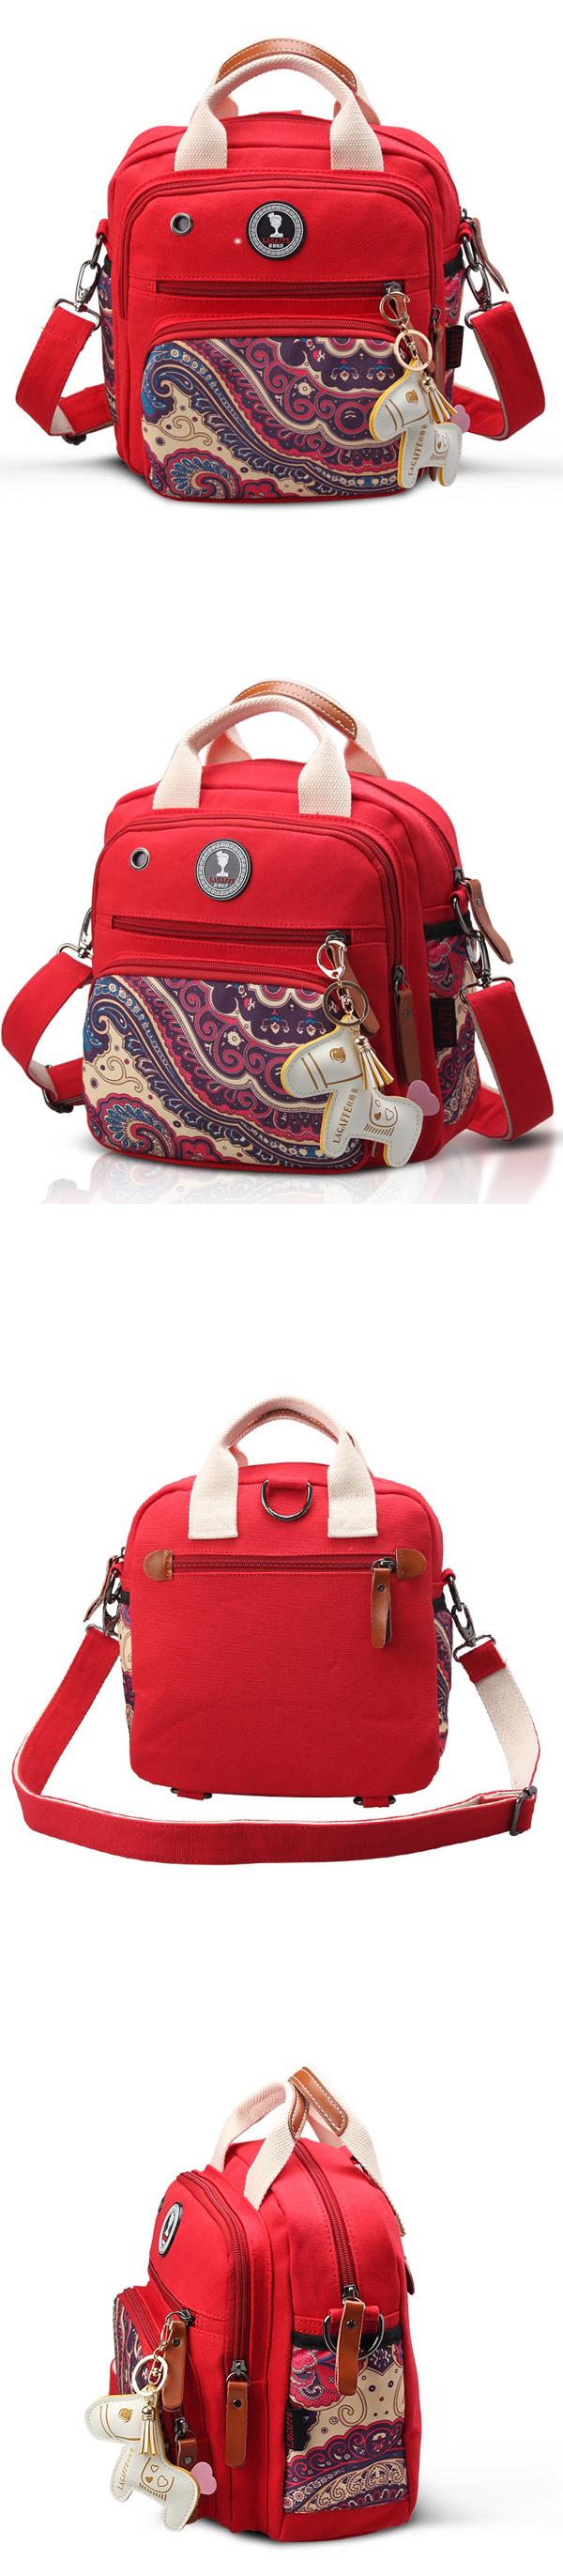 Women Canvas Multifunctional Print Shoulder Bags Backpack